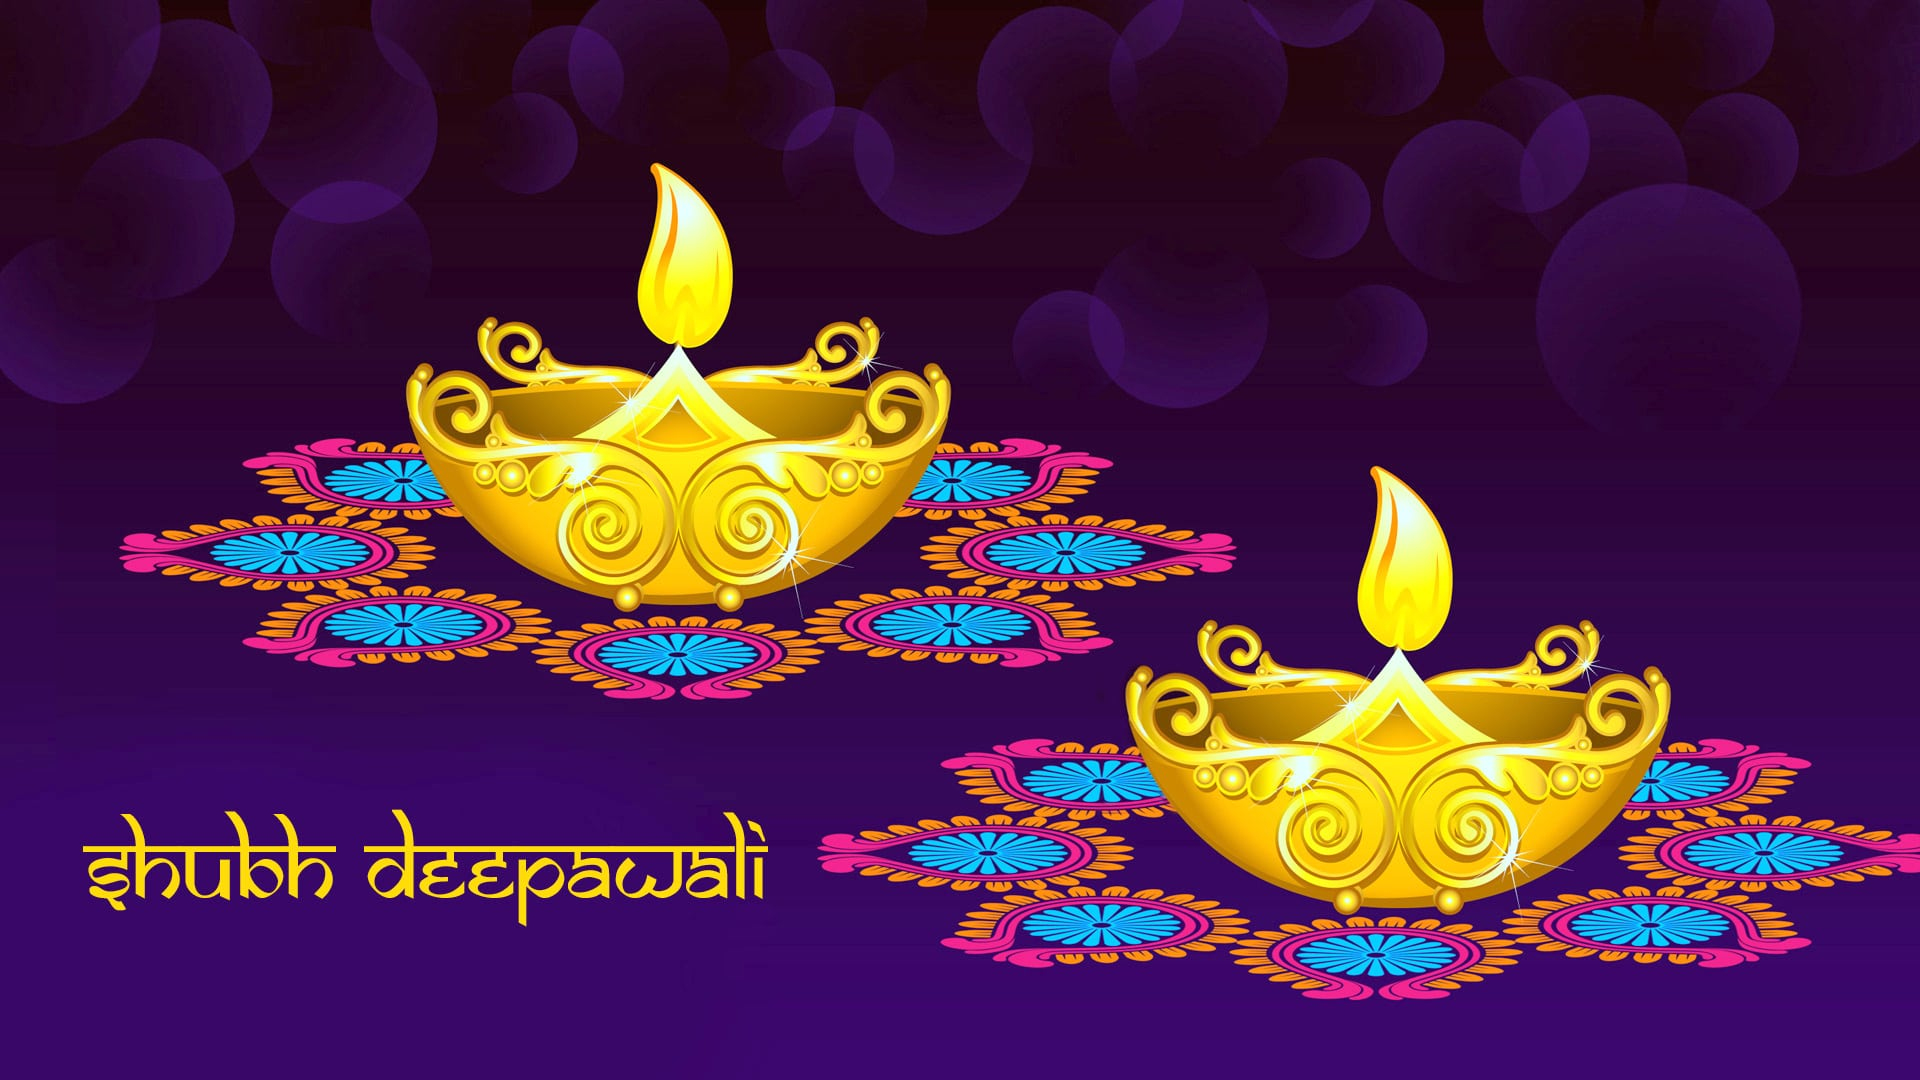 Shubh Deepawali Wallpaper